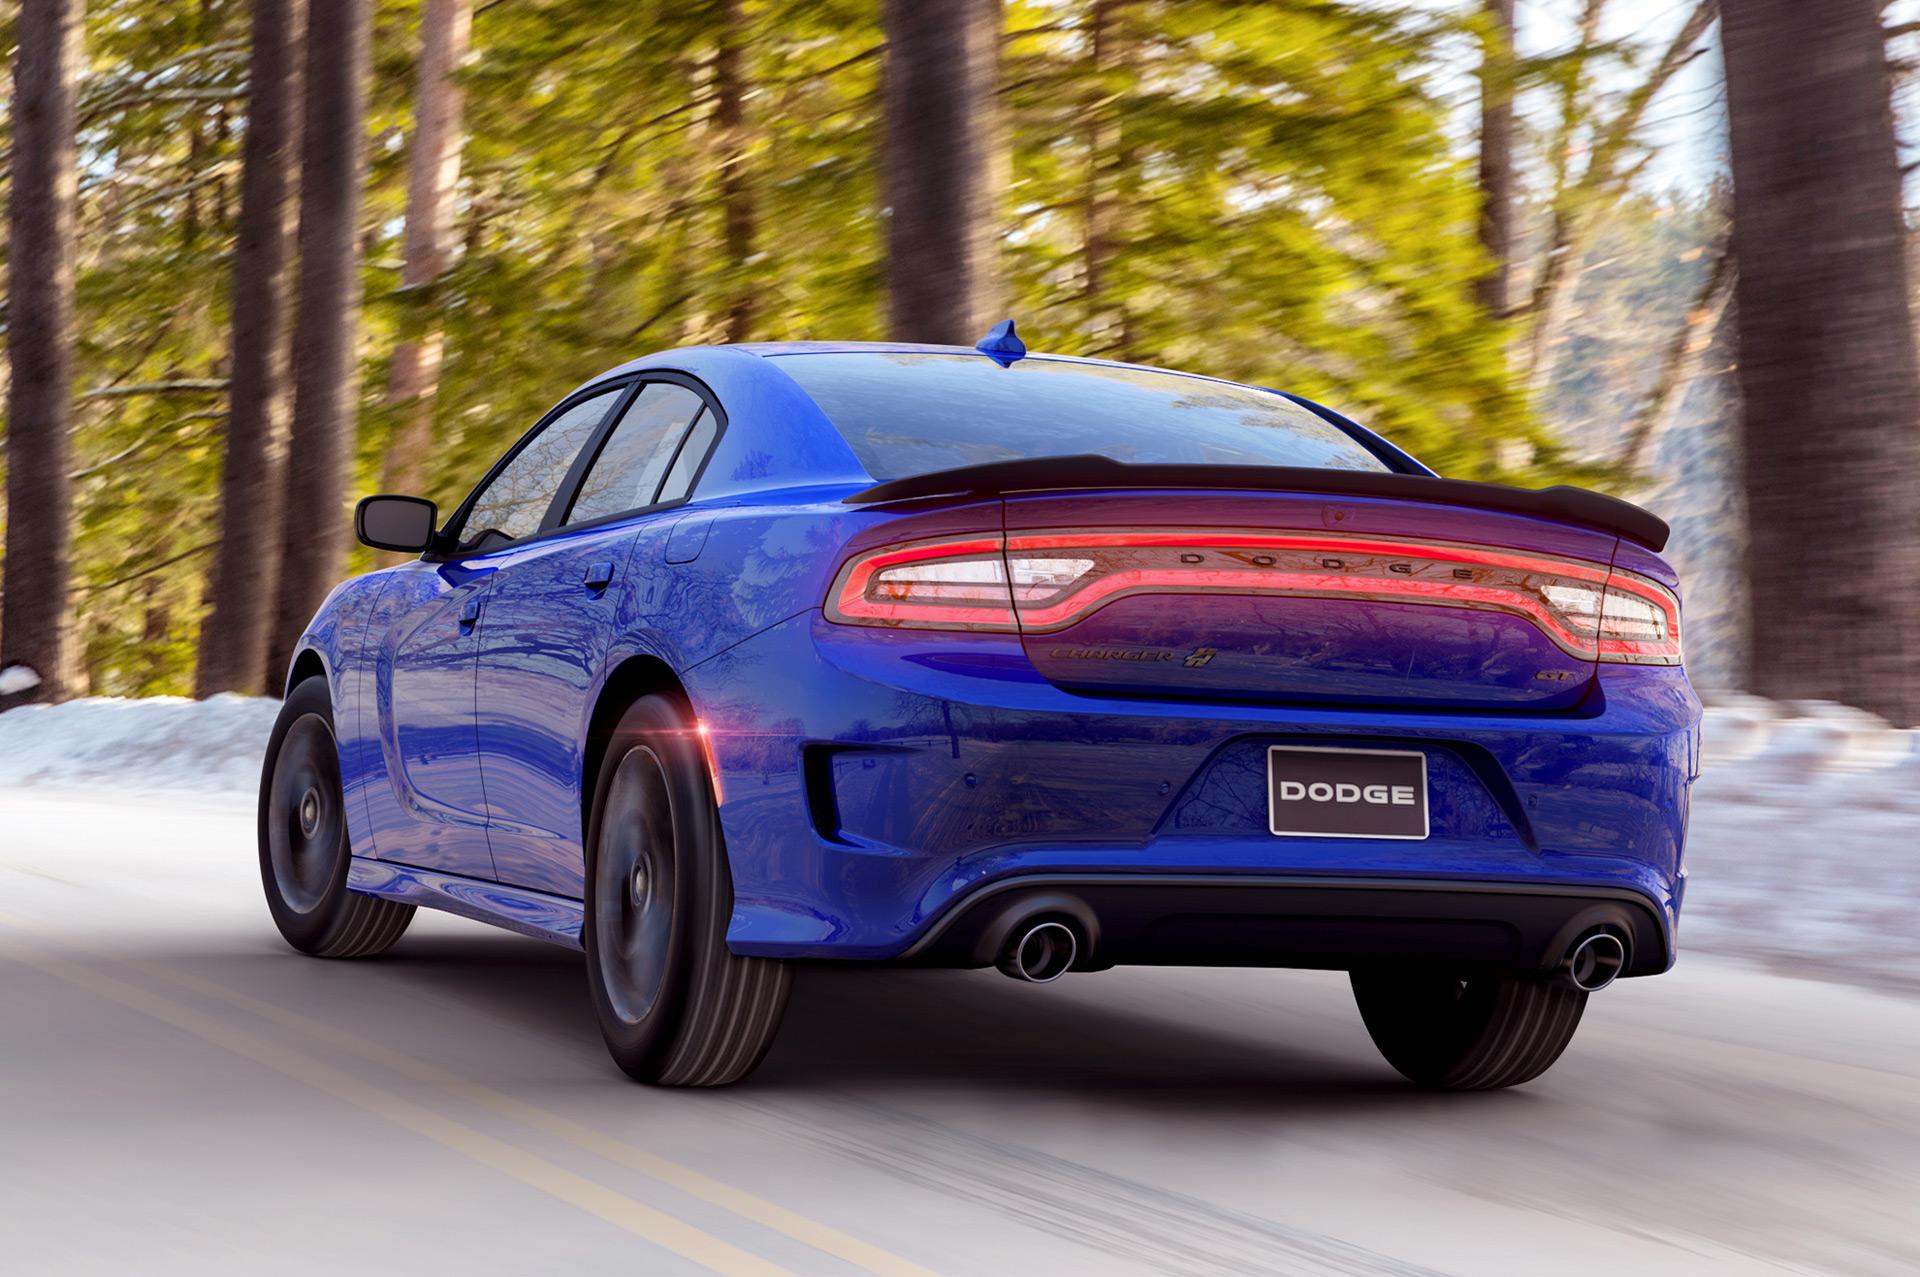 2020 Dodge Charger GT AWD, Ferrari EV, Cadillac bringing ...